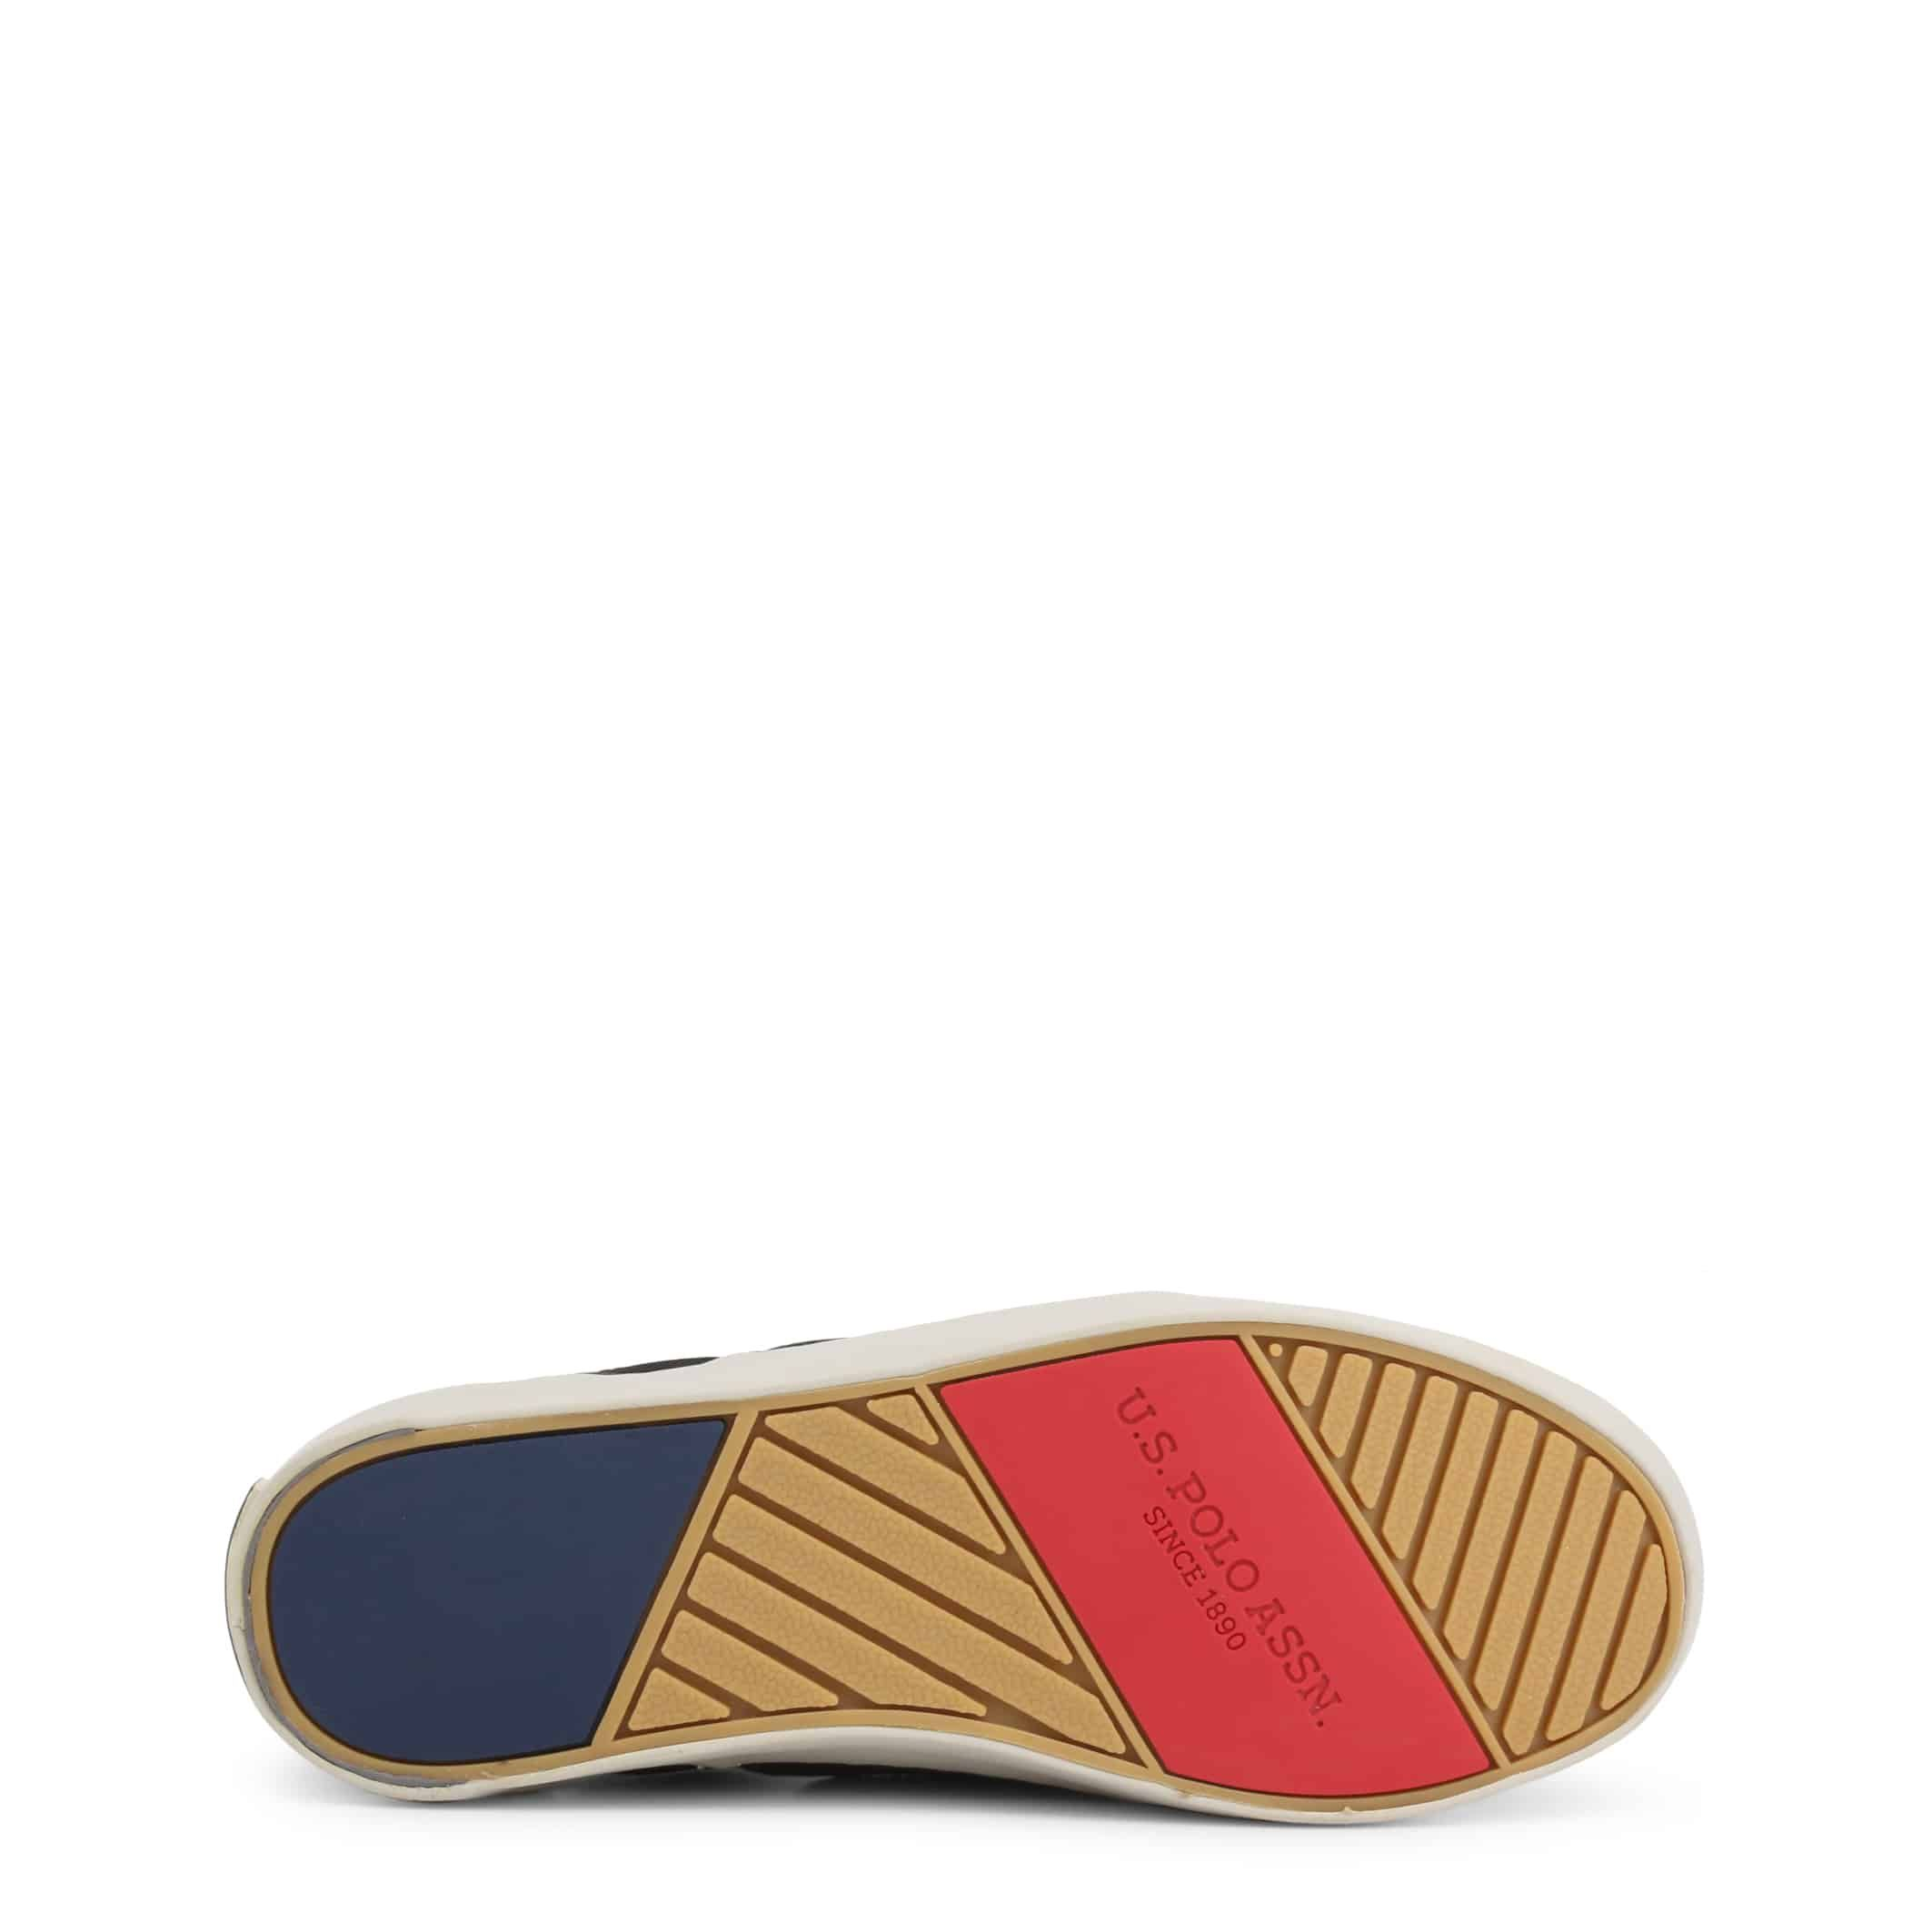 U.S. Polo Assn. | You Fashion Outlet